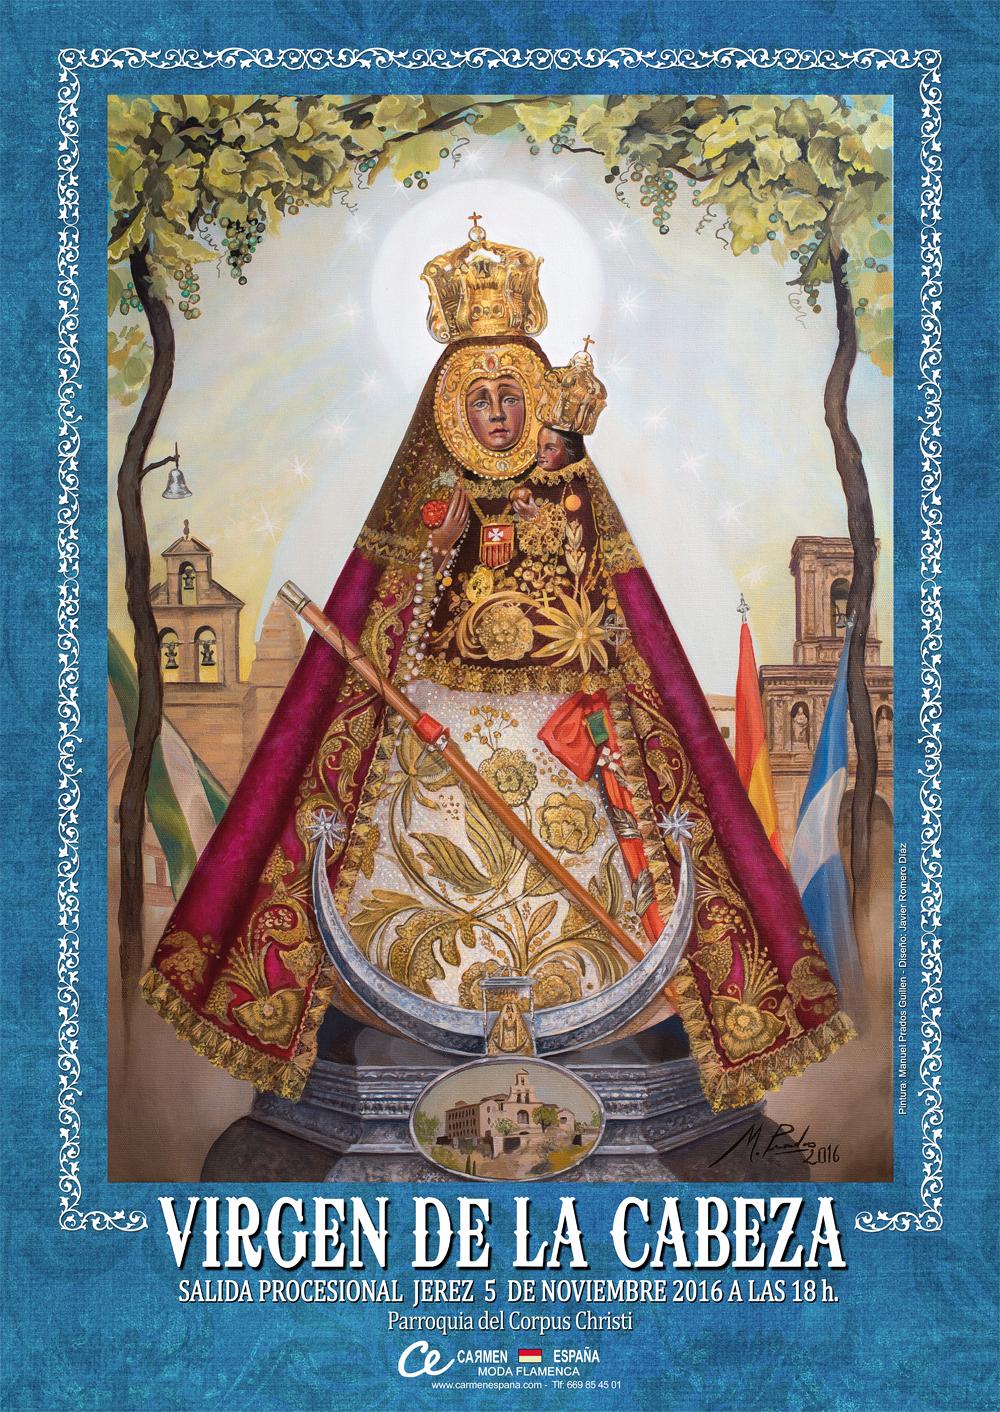 Cultos en honor a la Virgen de la Cabeza en la Parroquia del Corpus Christi